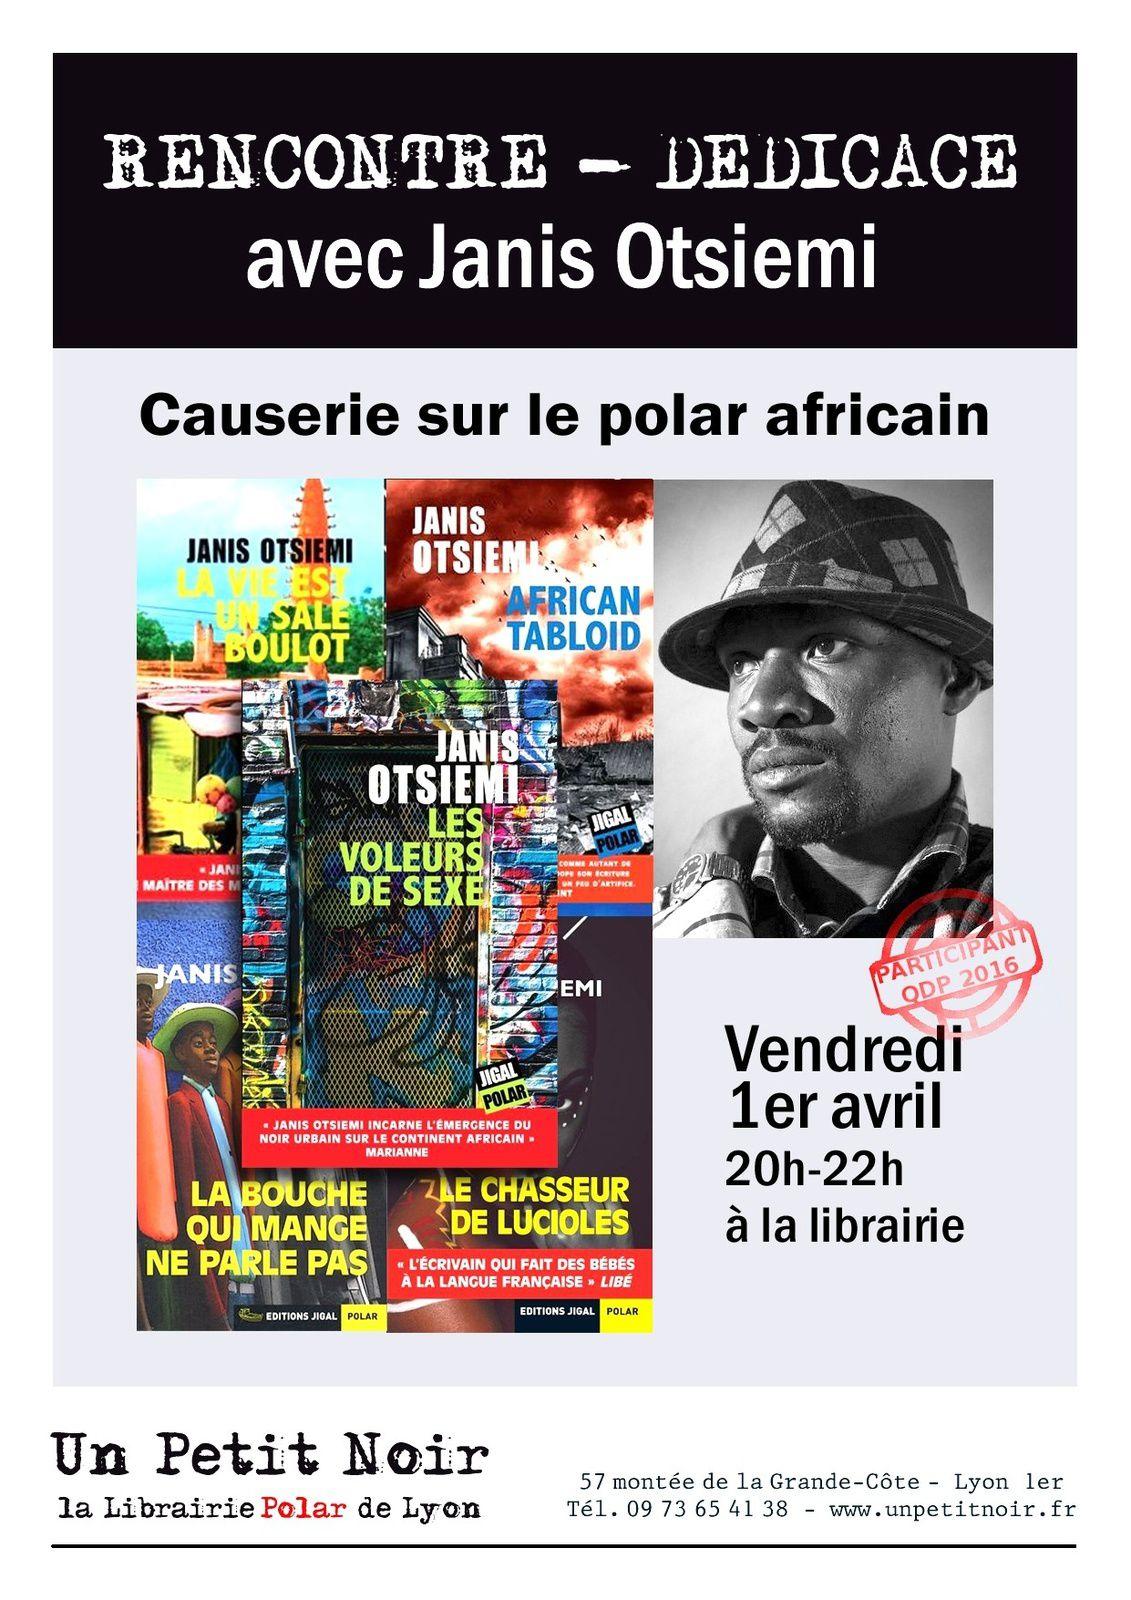 Janis Otsiemi, ce vendredi à Lyon